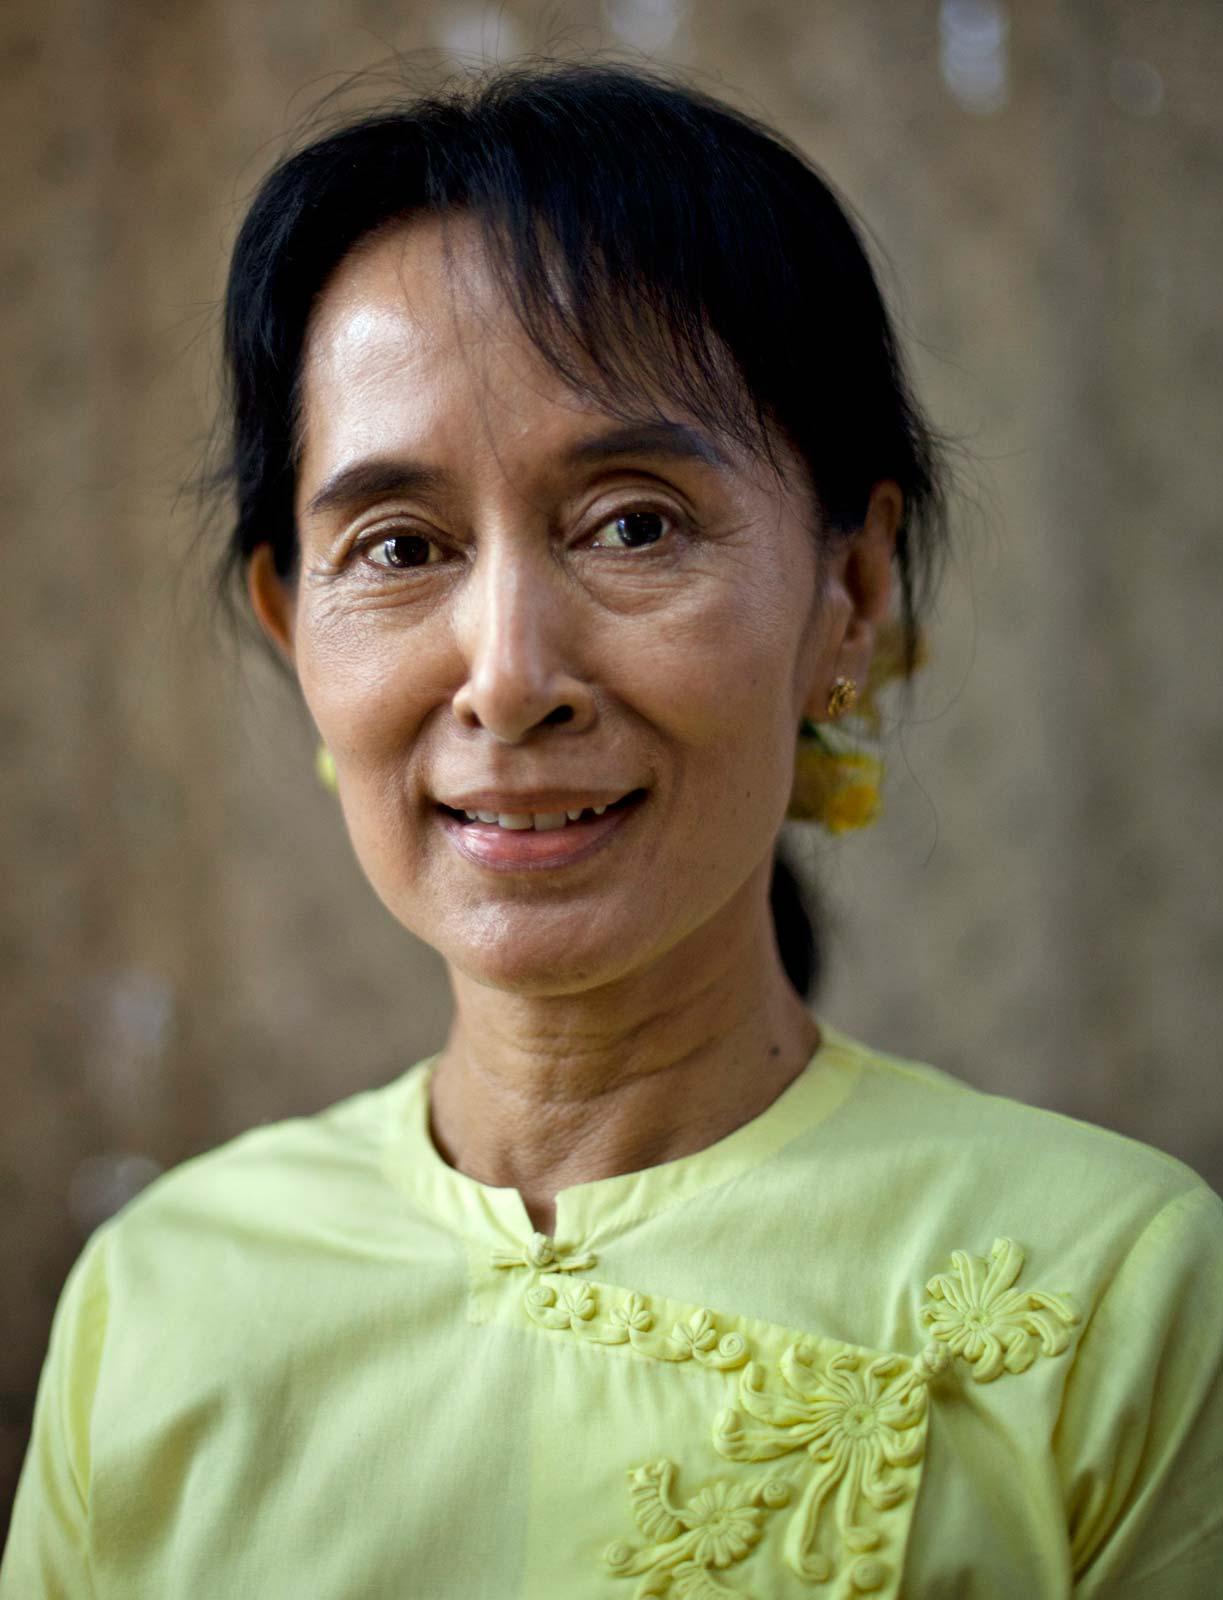 headshot of aung san suu kyi